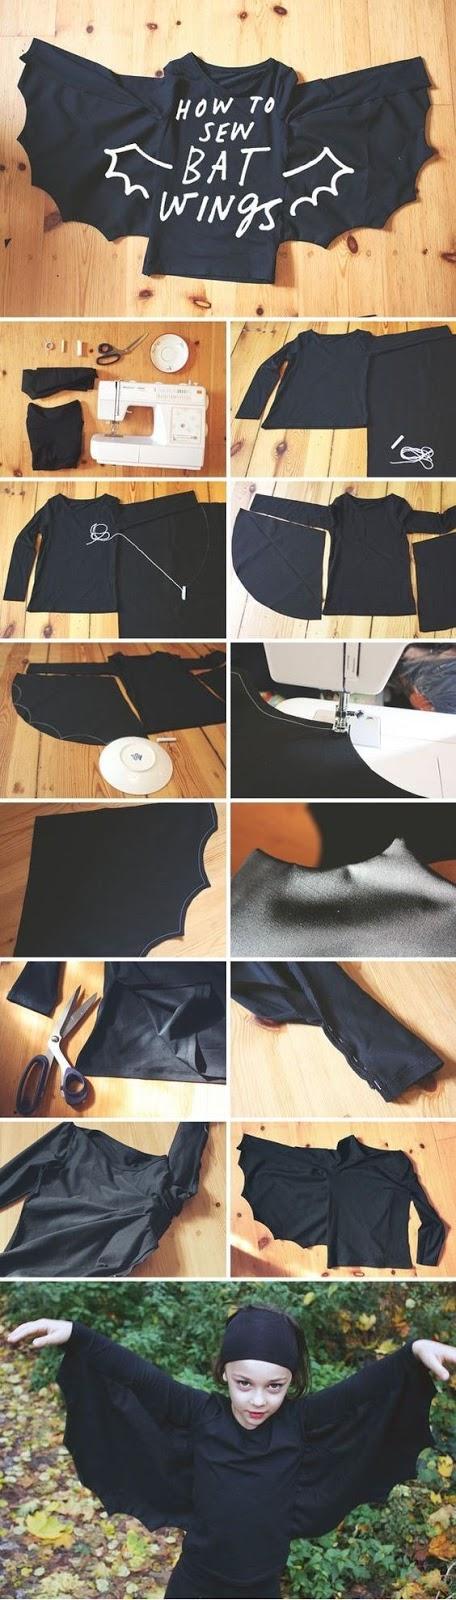 fotos de disfraz casero de murciélago